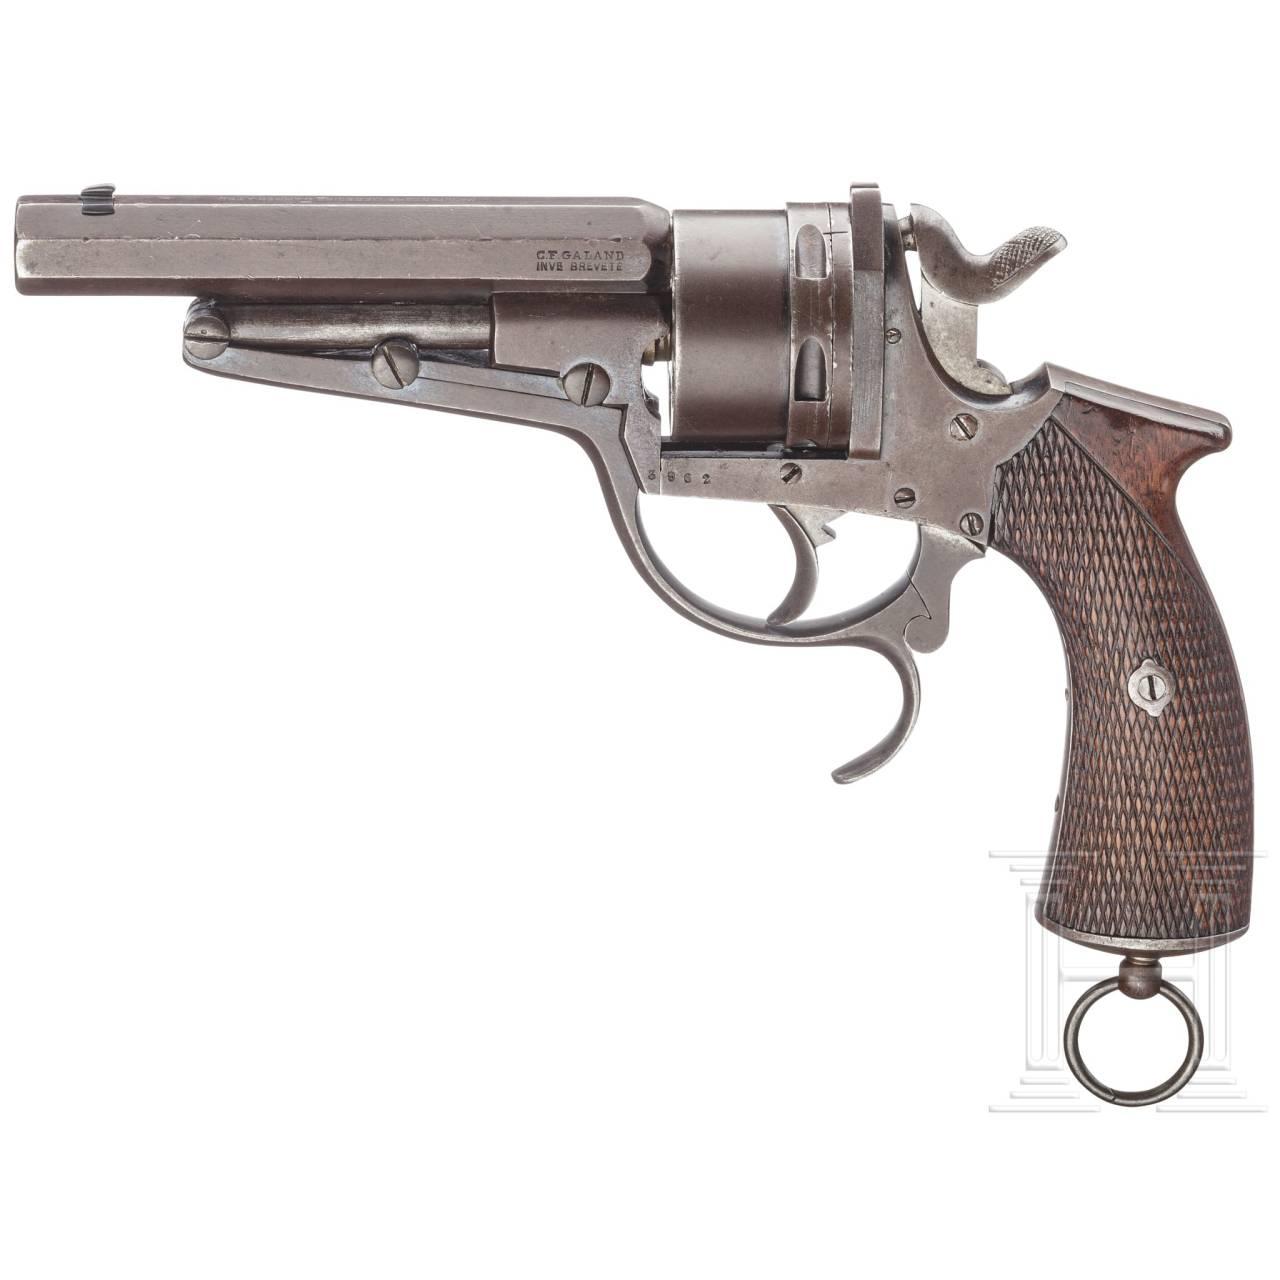 Revolver System Galand 1874 , Grenzwache